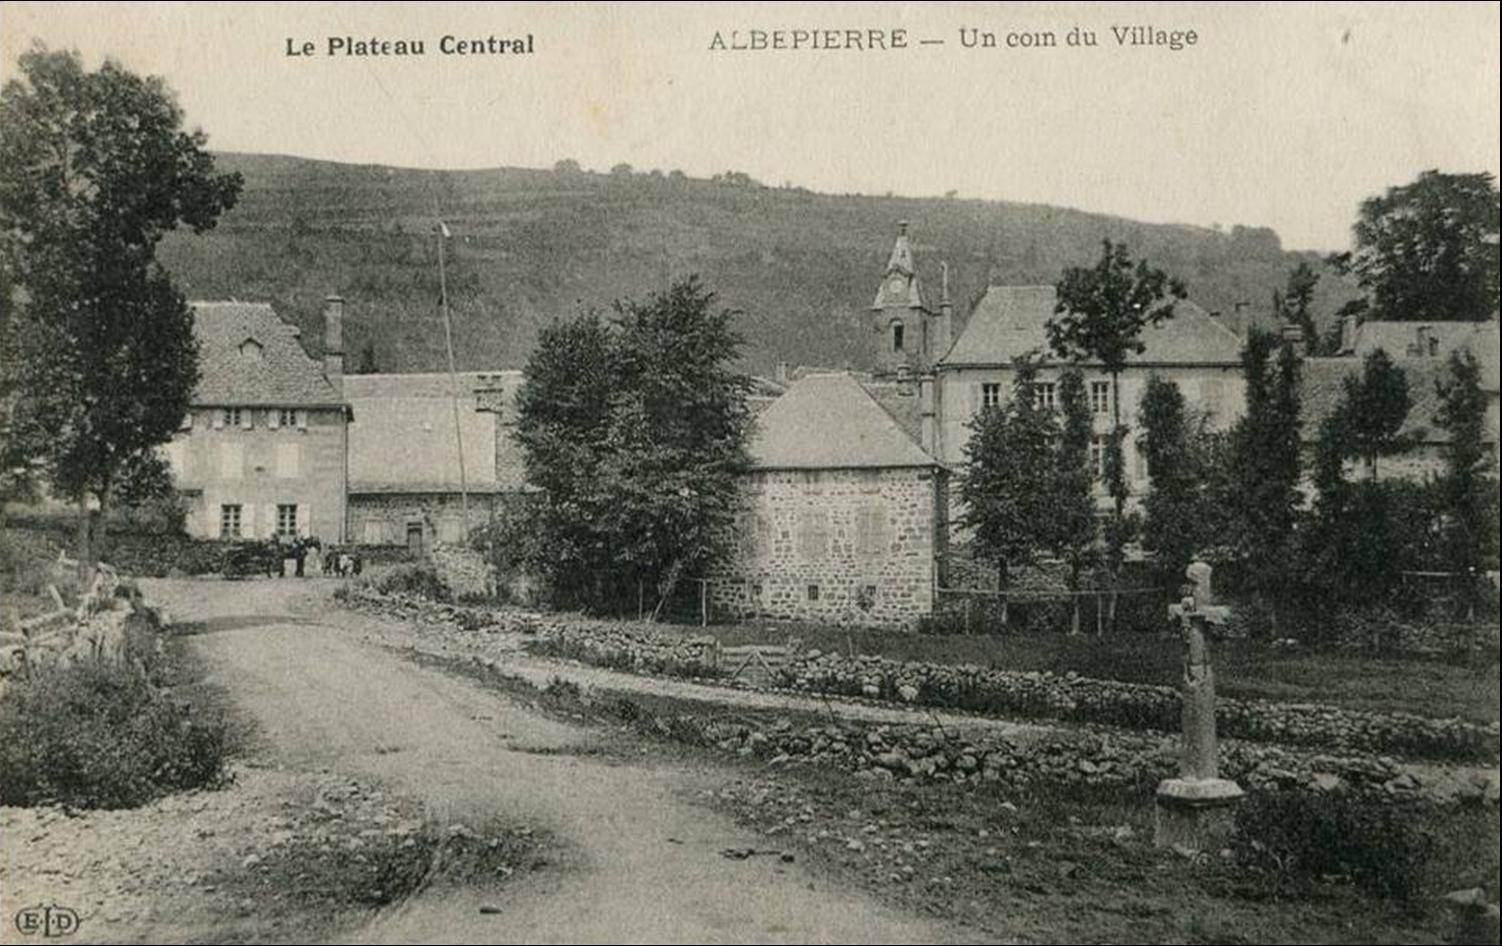 Albepierre